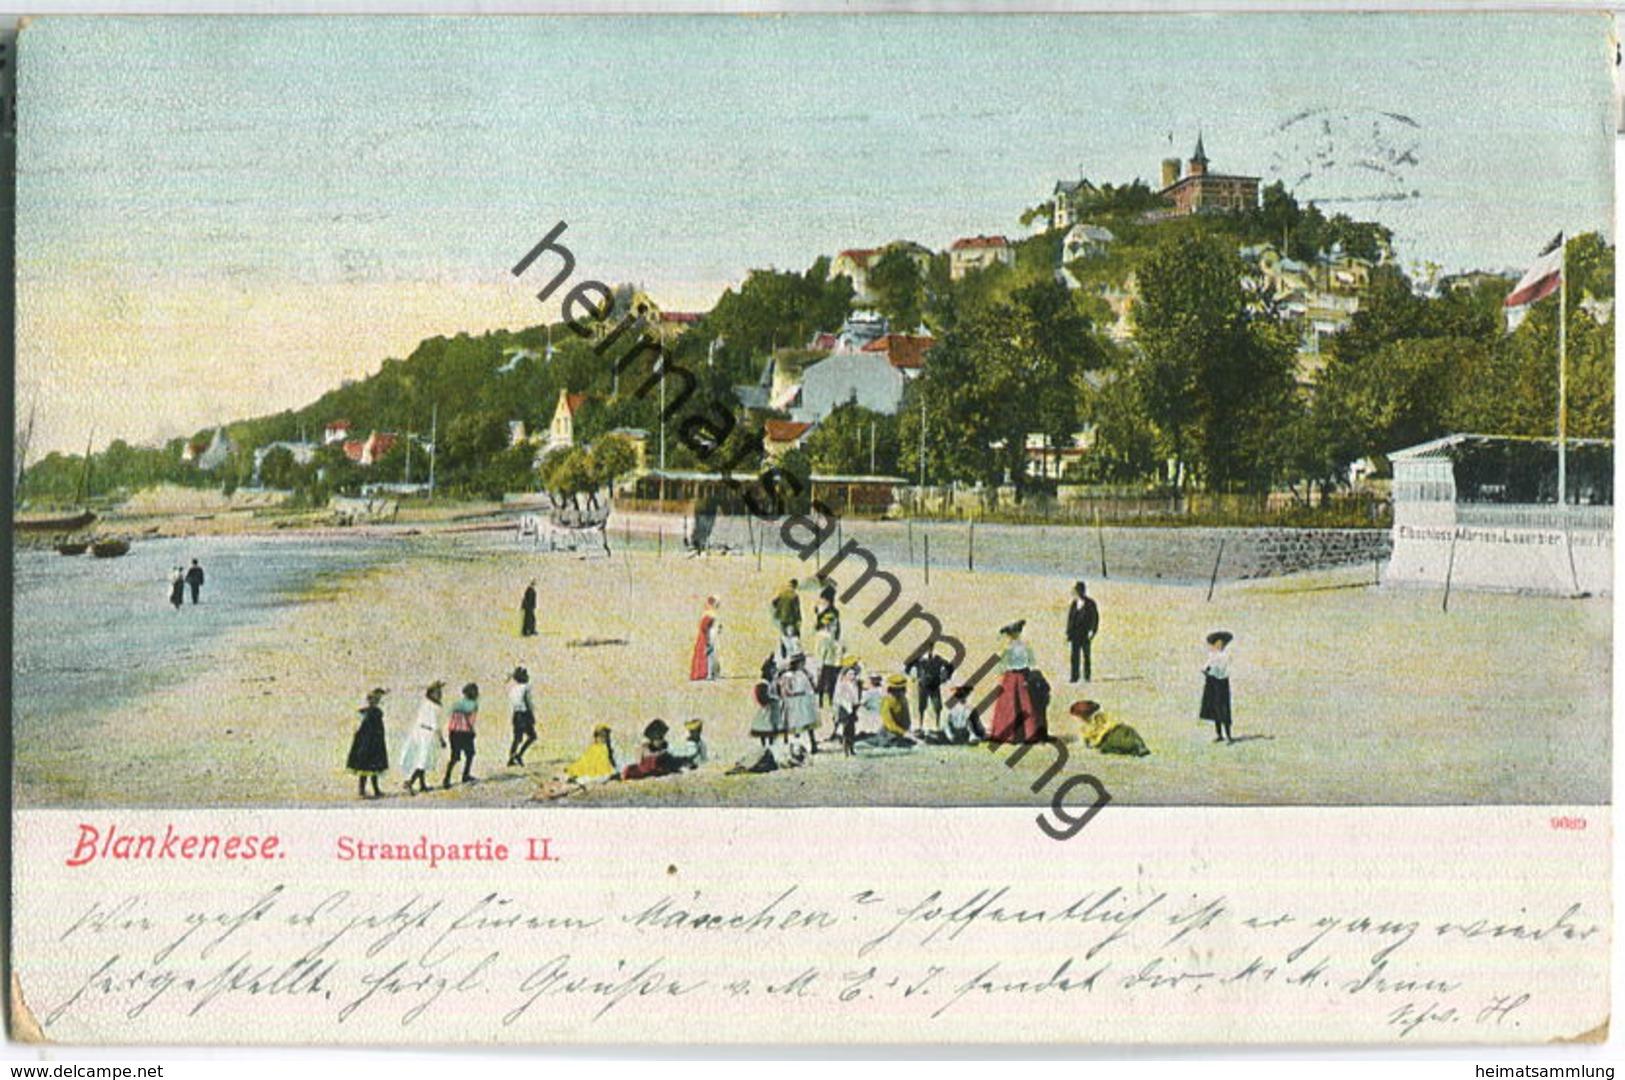 Hamburg-Blankenese - Strandpartie - Verlag A.N.H. 1907 - Blankenese